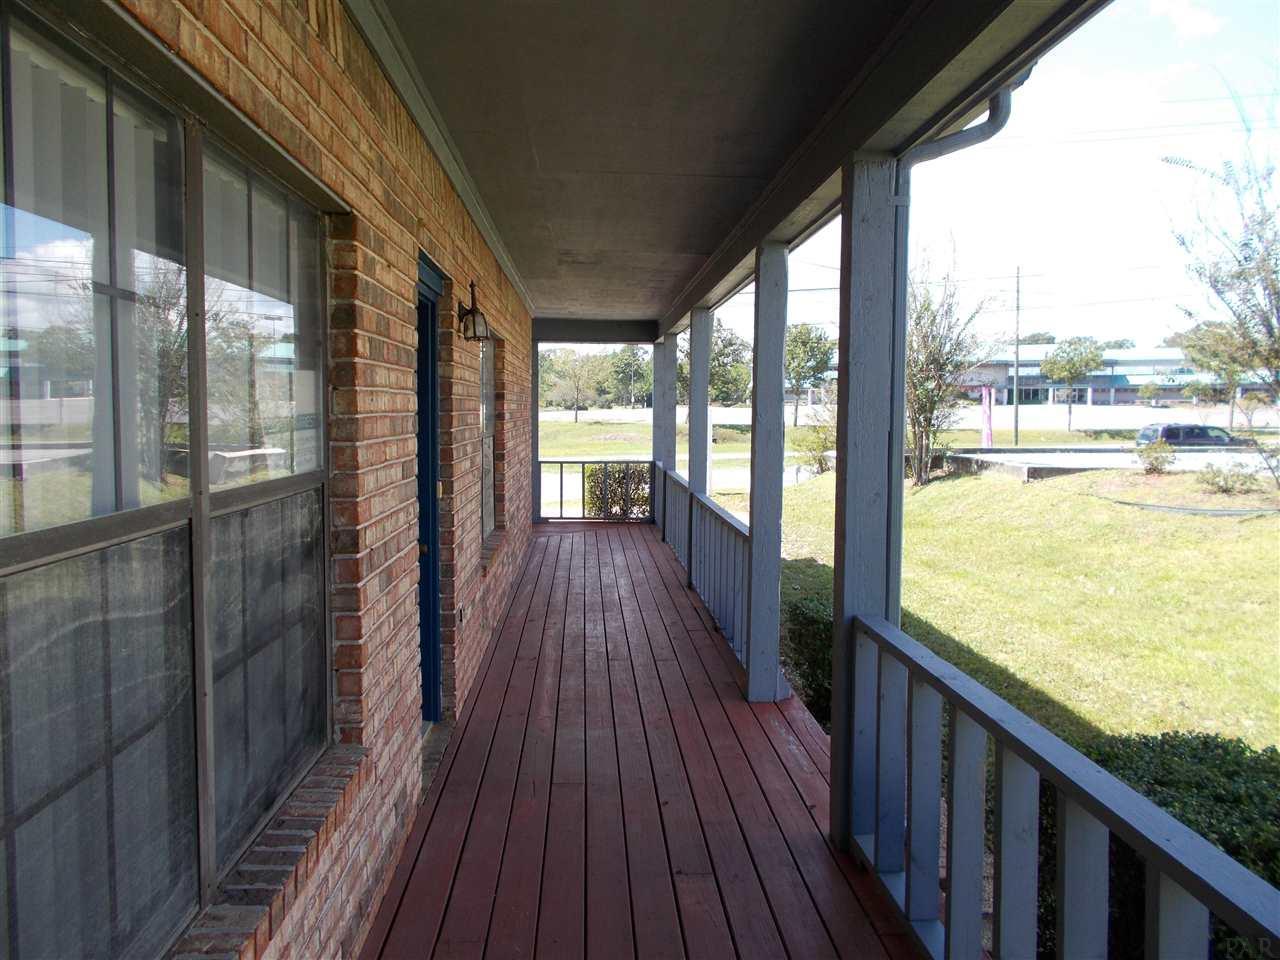 7840 Pine Forest Rd, Pensacola, FL 32526